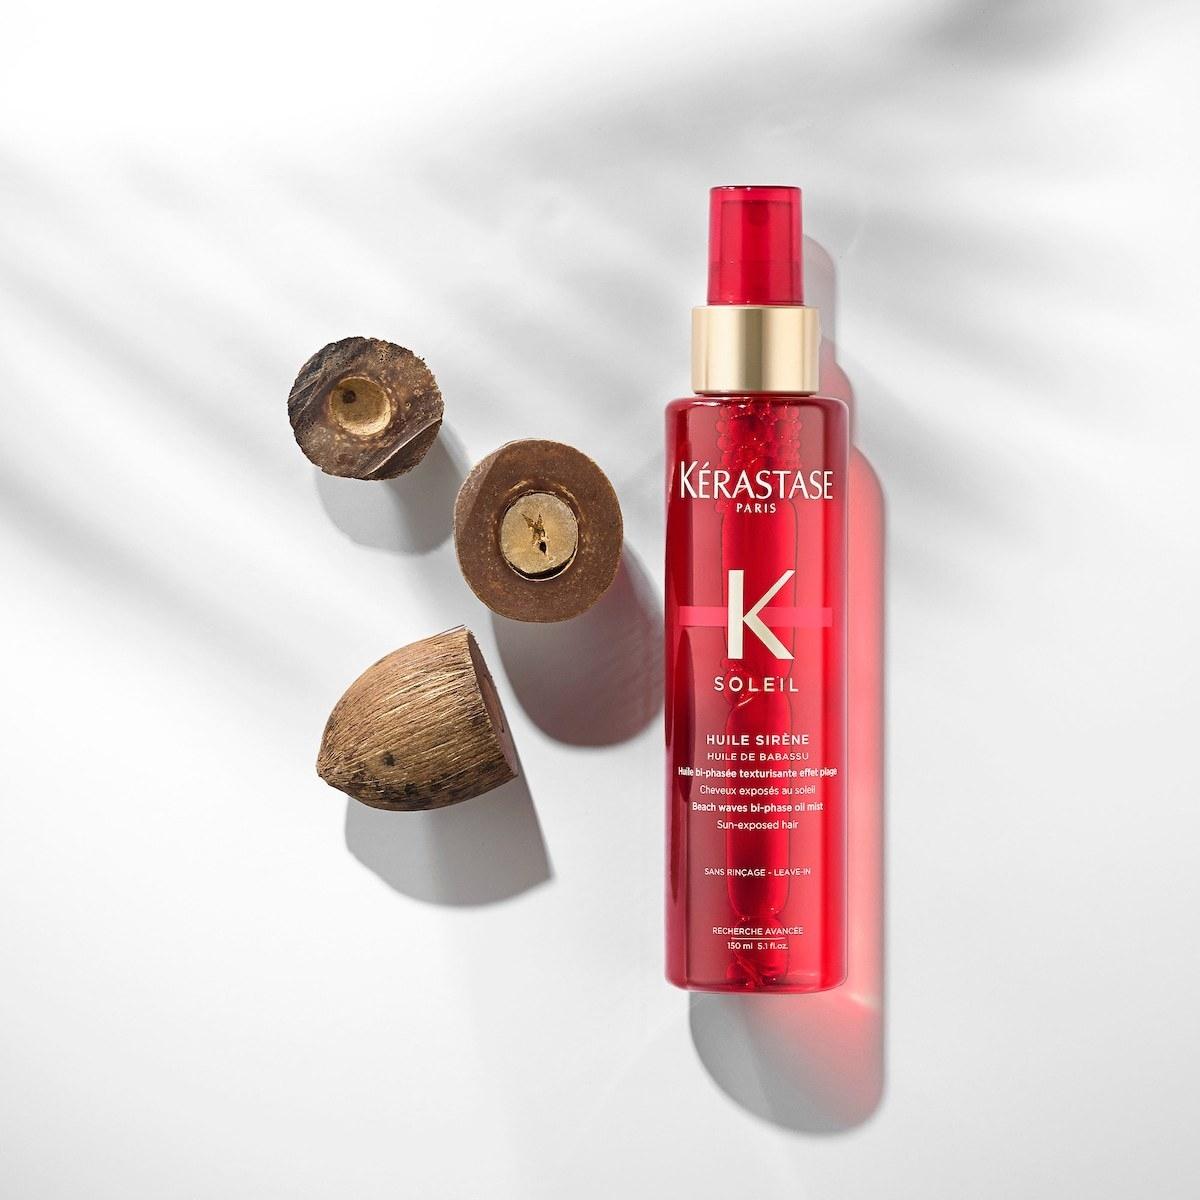 The red spray bottle next to a few babassu seeds